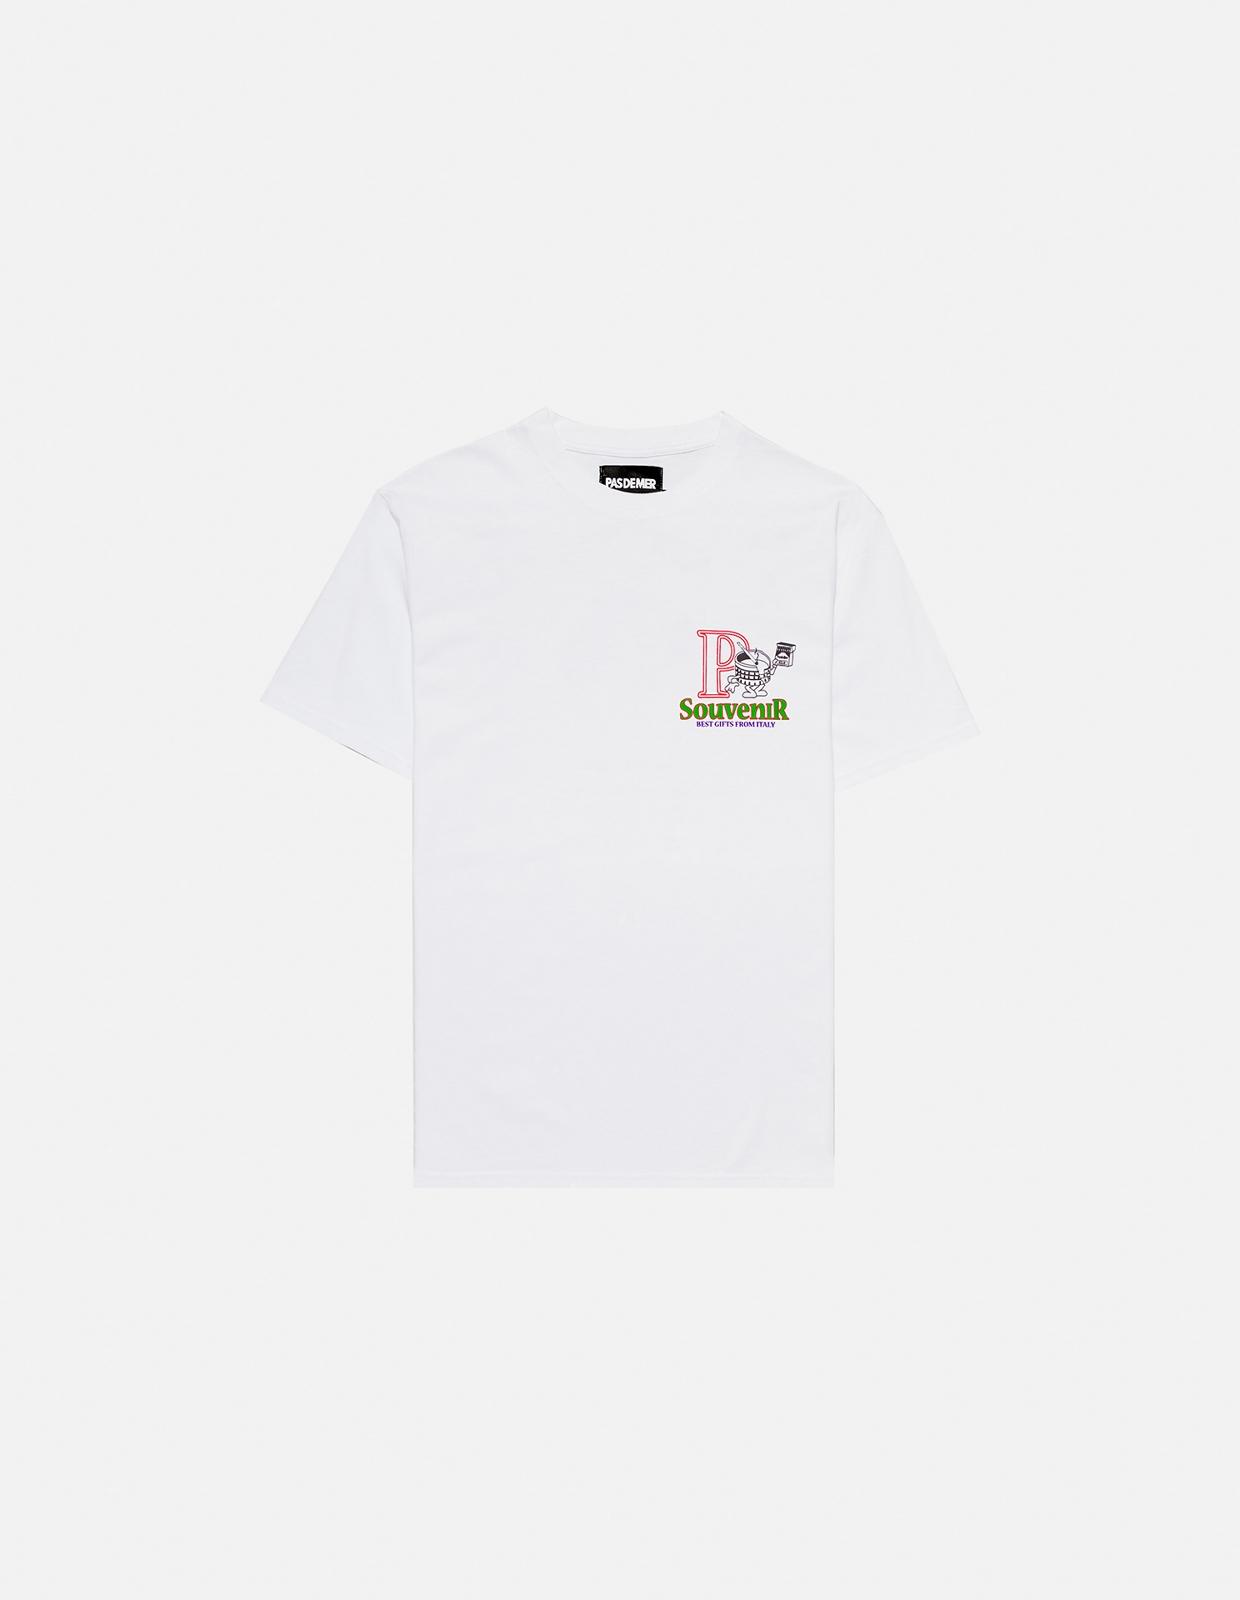 【PAS DE MER/パドゥメ】SOUVENIR T-SHIRT Tシャツ / WHITE